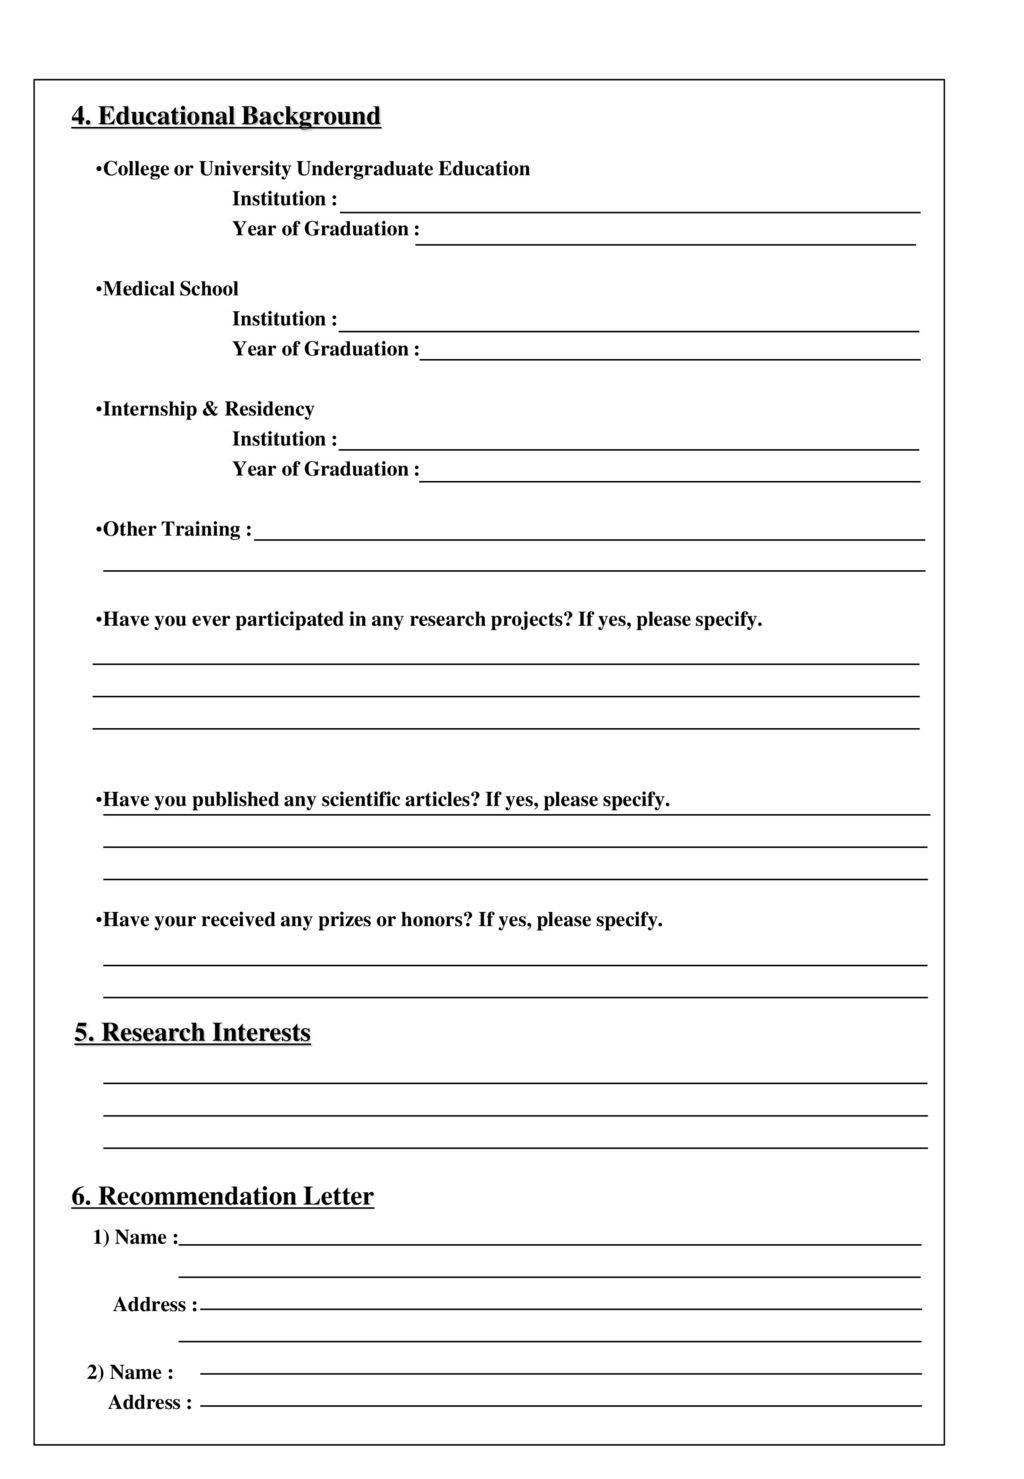 Wooridul Spine Hospital Fellowship Program Application Form